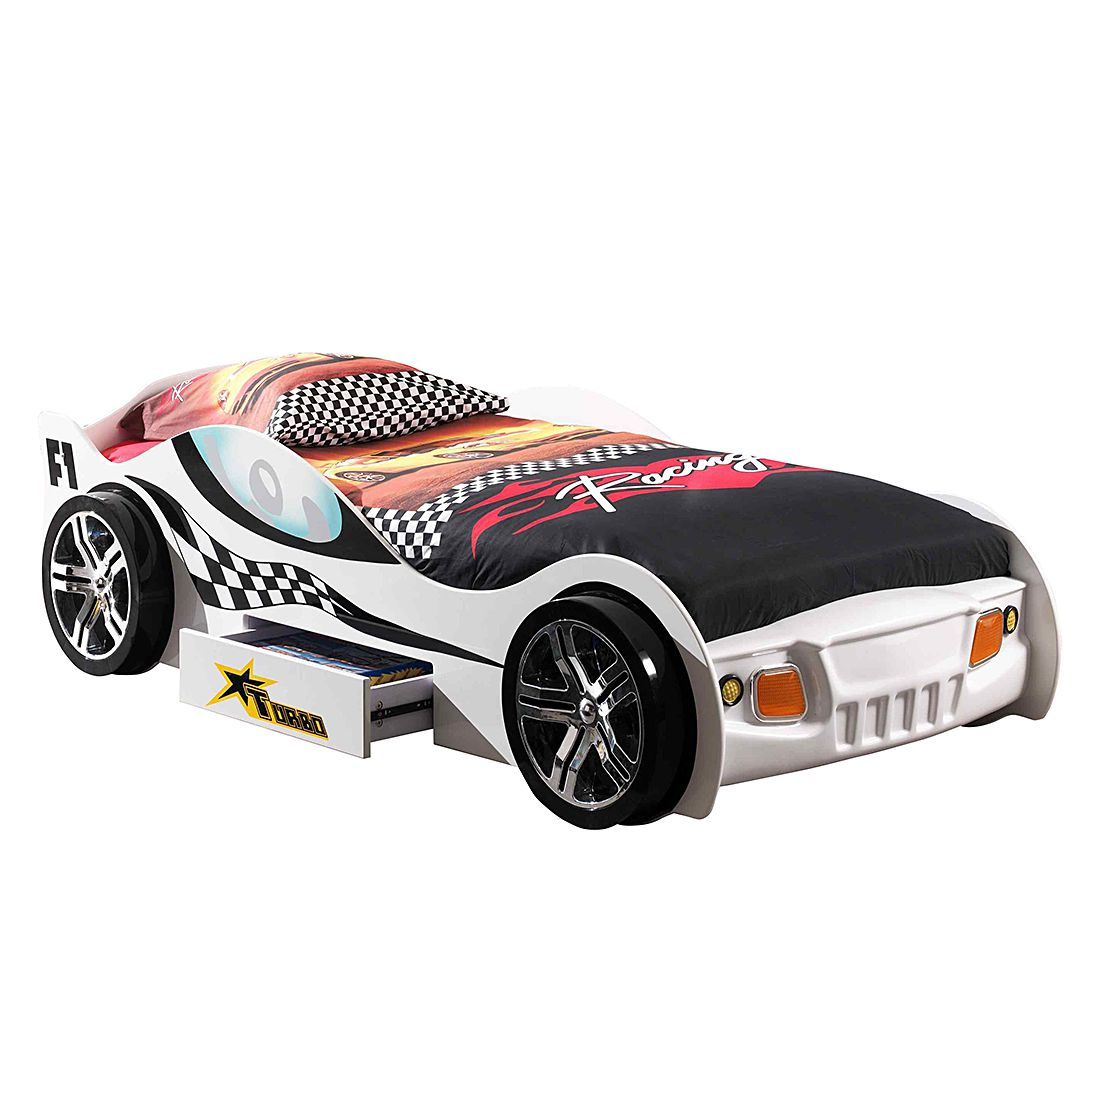 home24 Autobett Turbo Racing | Kinderzimmer | Weiss | Vipack